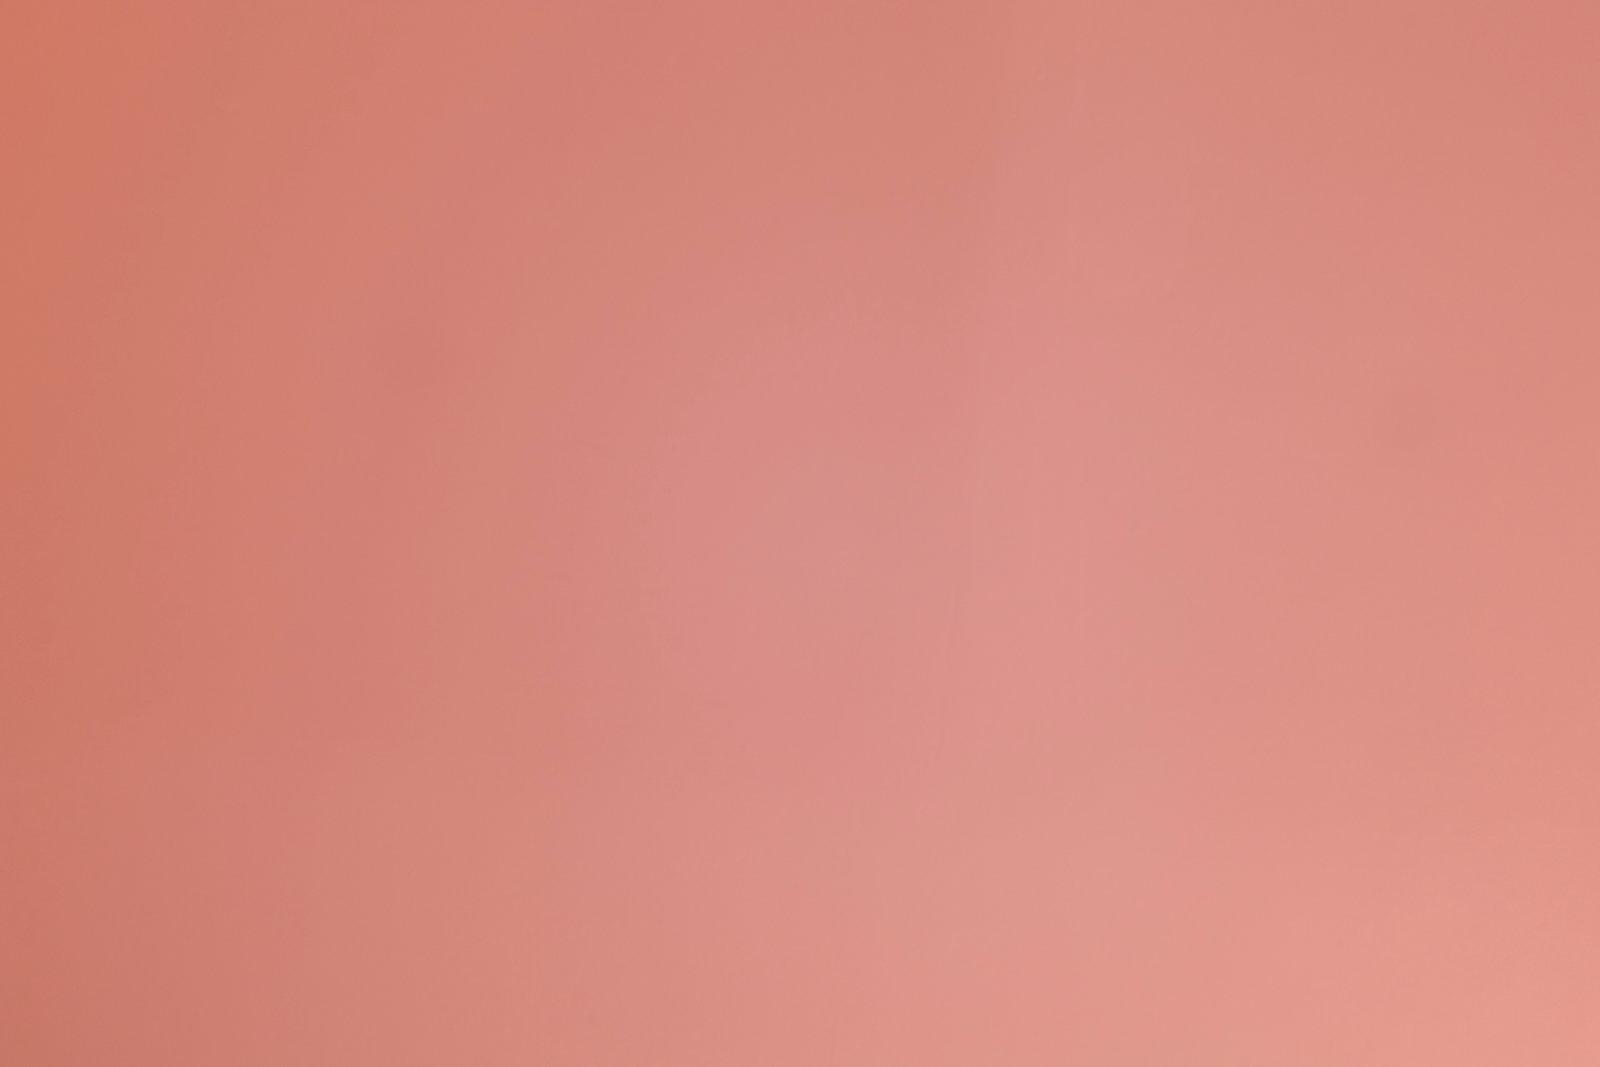 test infrarouge HOTSPOT 24mm F8 CANON | Pierre-Louis Ferrer | Test du SIGMA 24mm F/1.4 DG HSM Art en photographie infrarouge | Partie 1